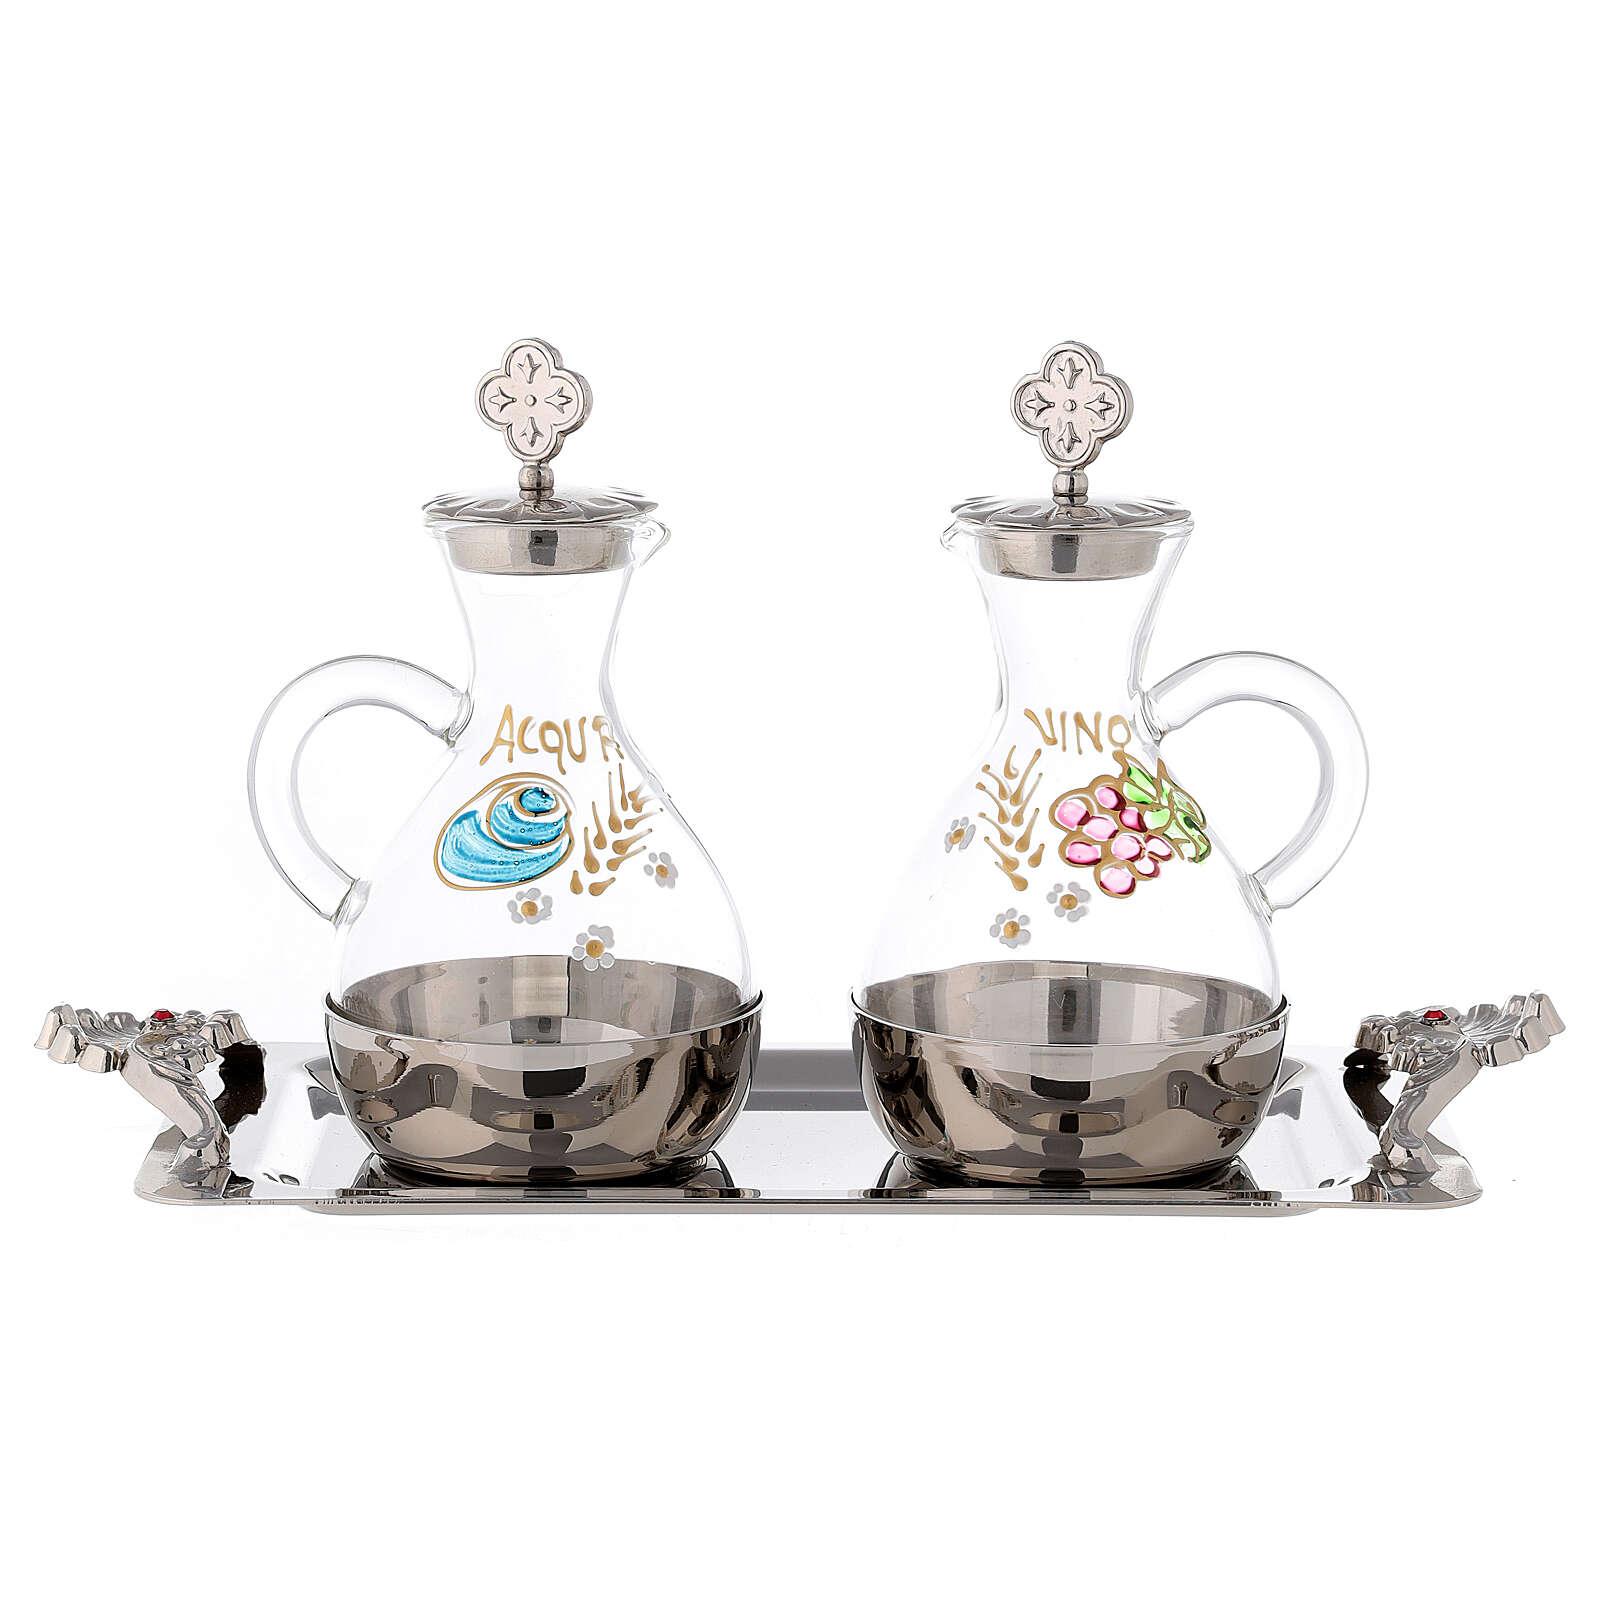 Palermo cruet set in silver-plated brass 140 ml 4